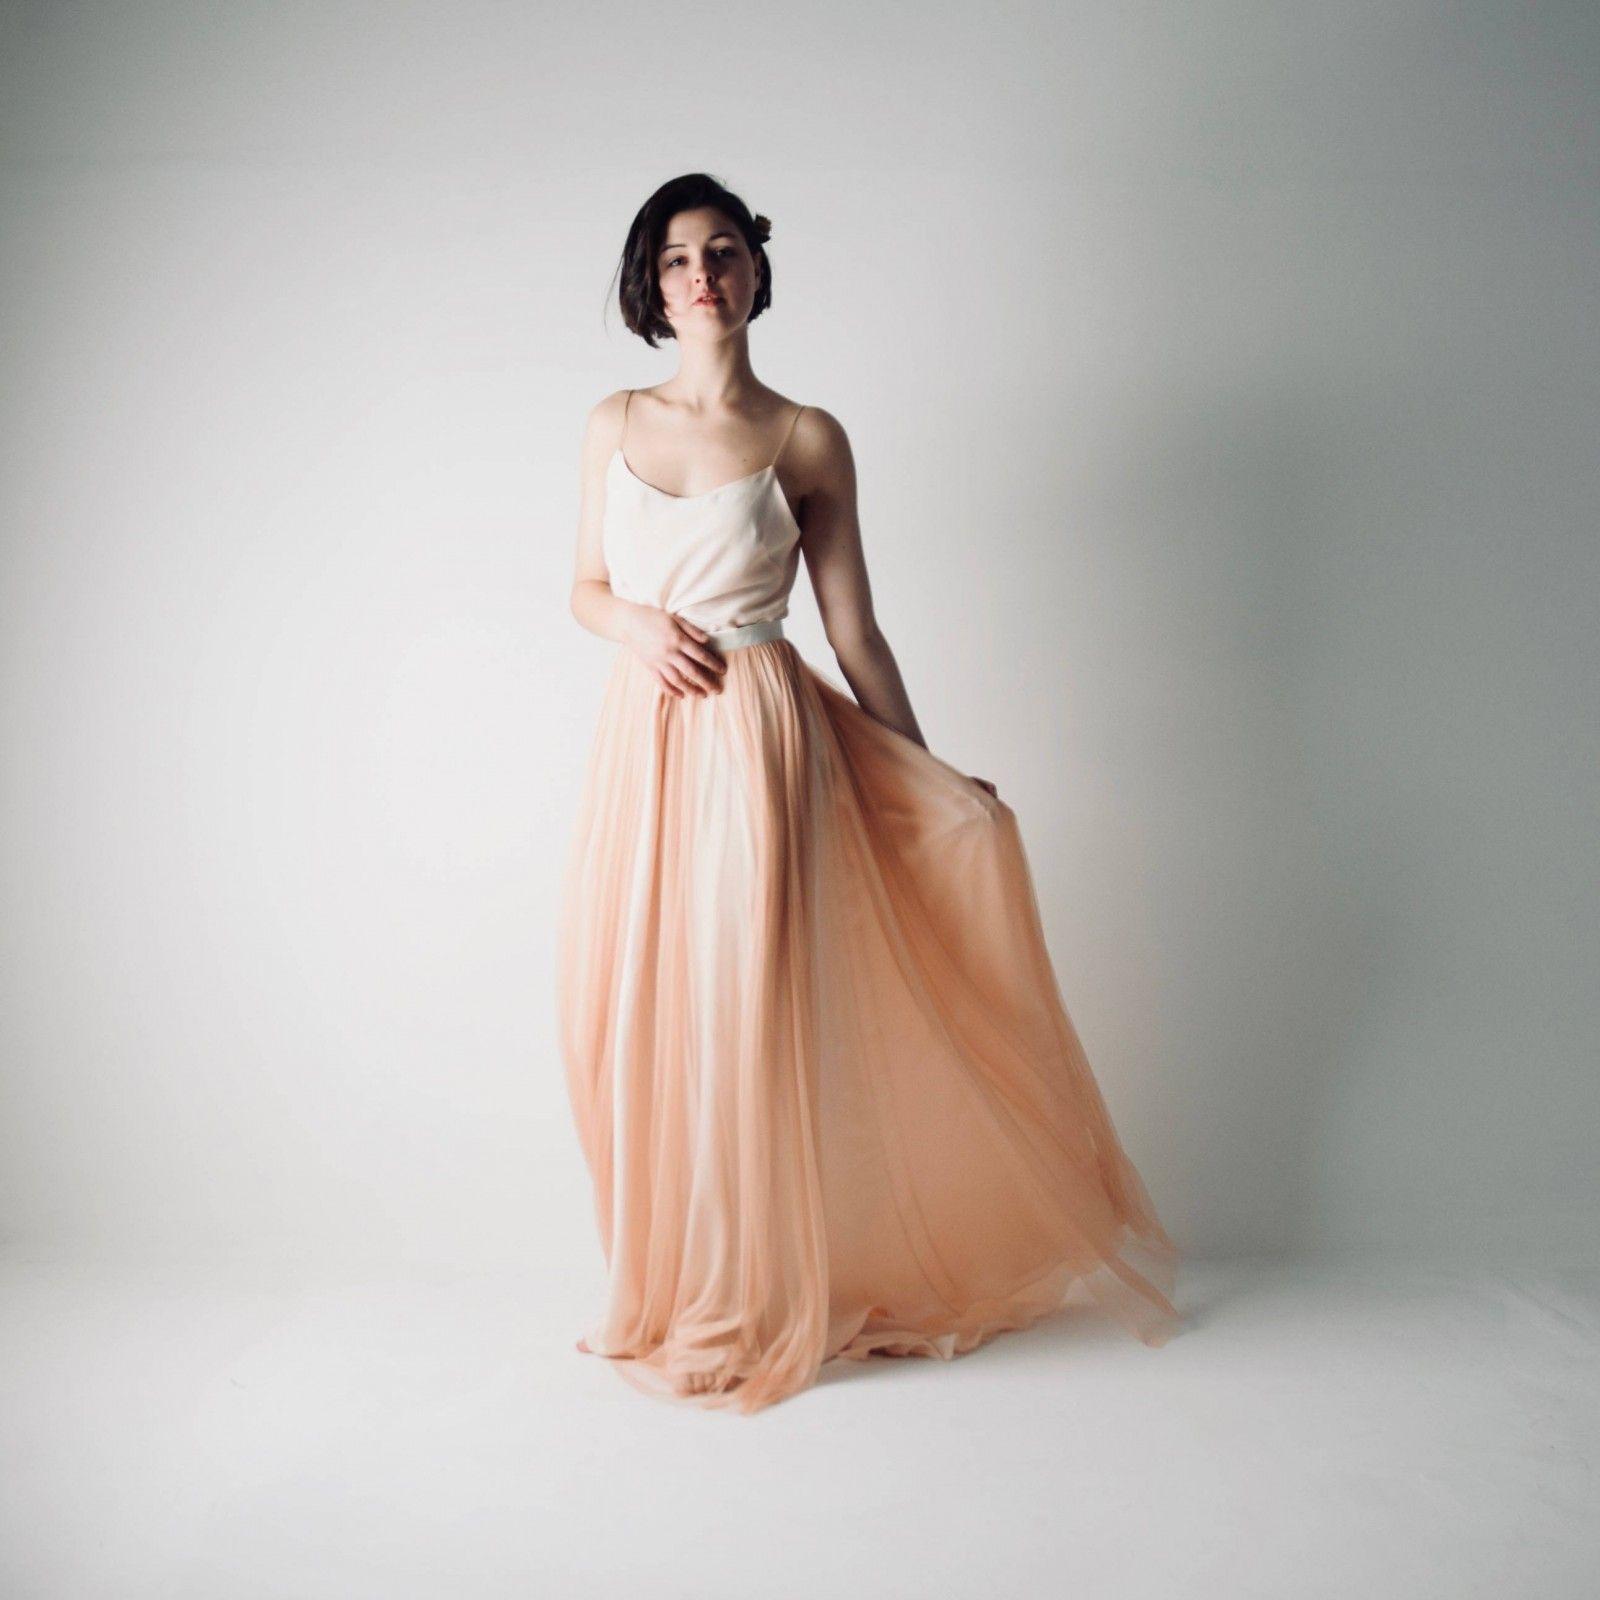 Abelia blush wedding dress separates tulle skirt and top